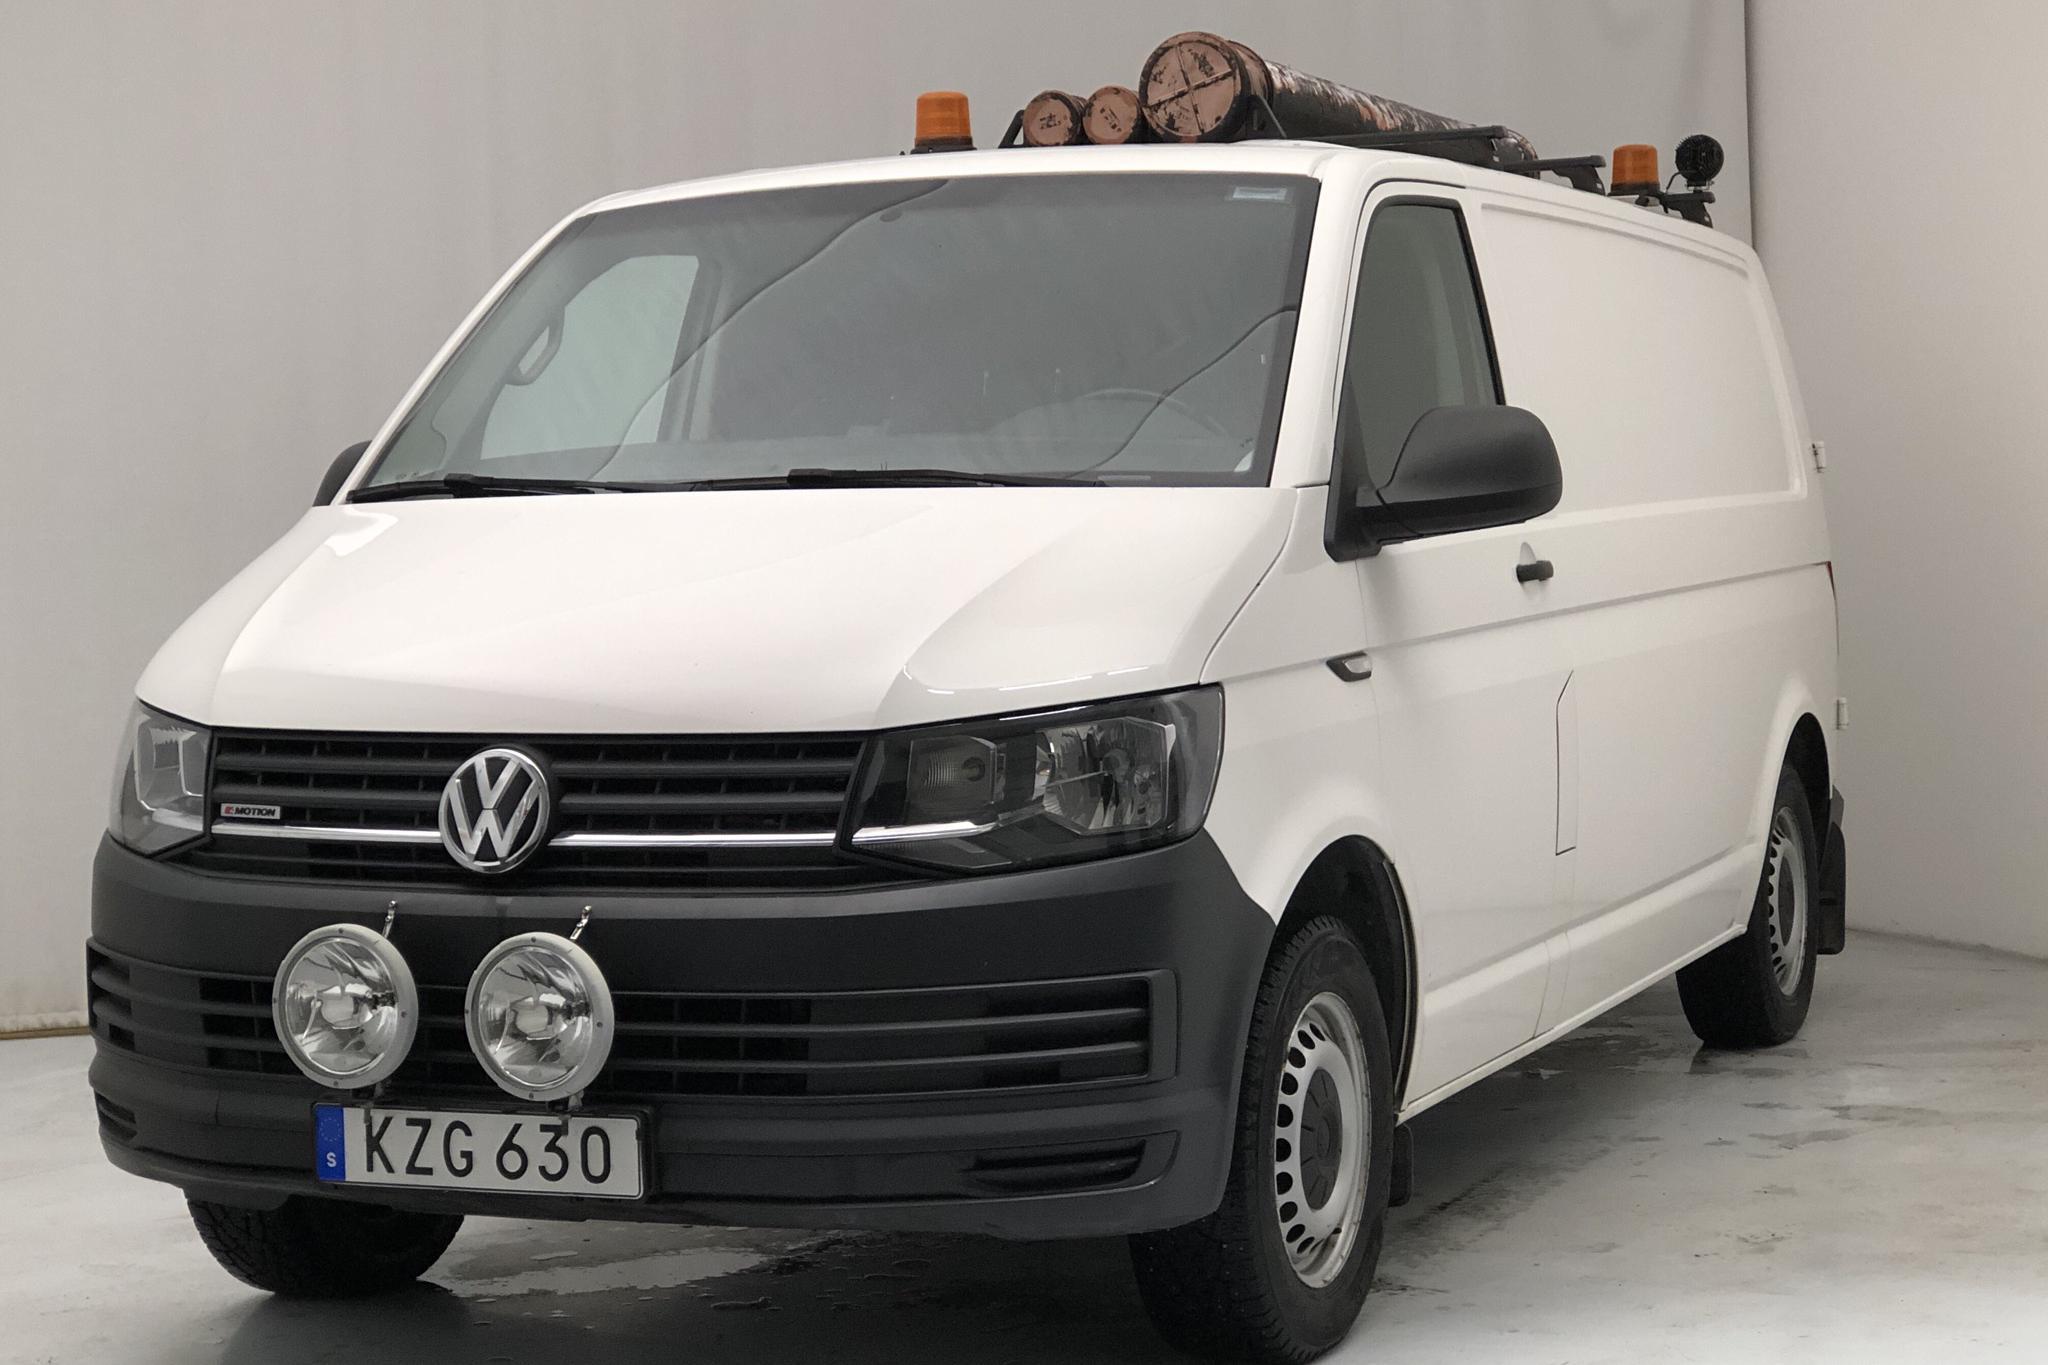 VW Transporter T6 2.0 TDI BMT Skåp 4MOTION (140hk) - 109 610 km - Manual - white - 2016